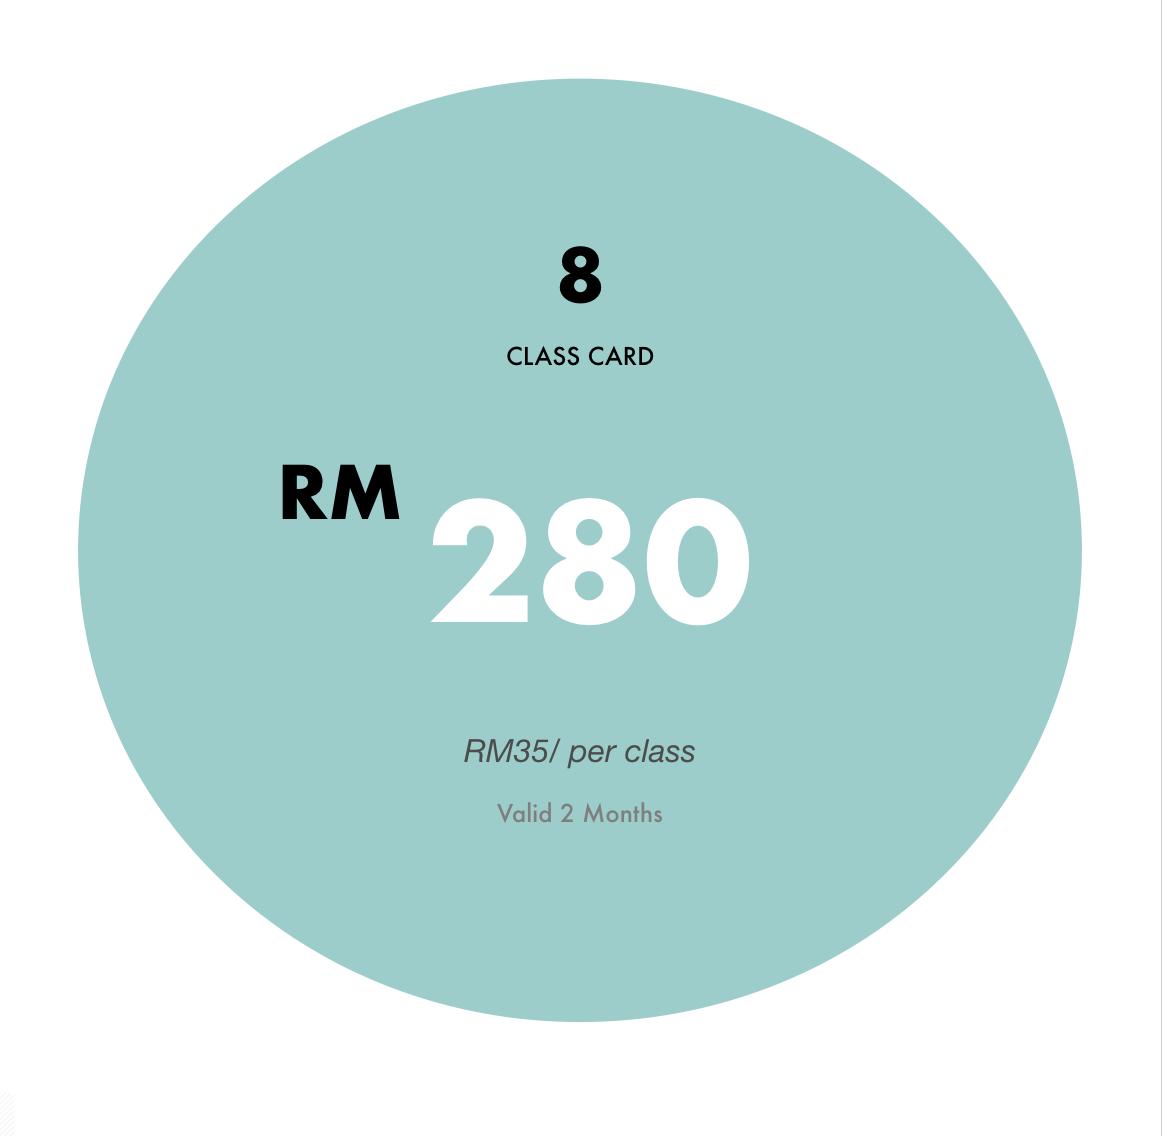 MYR31.25 Per Class